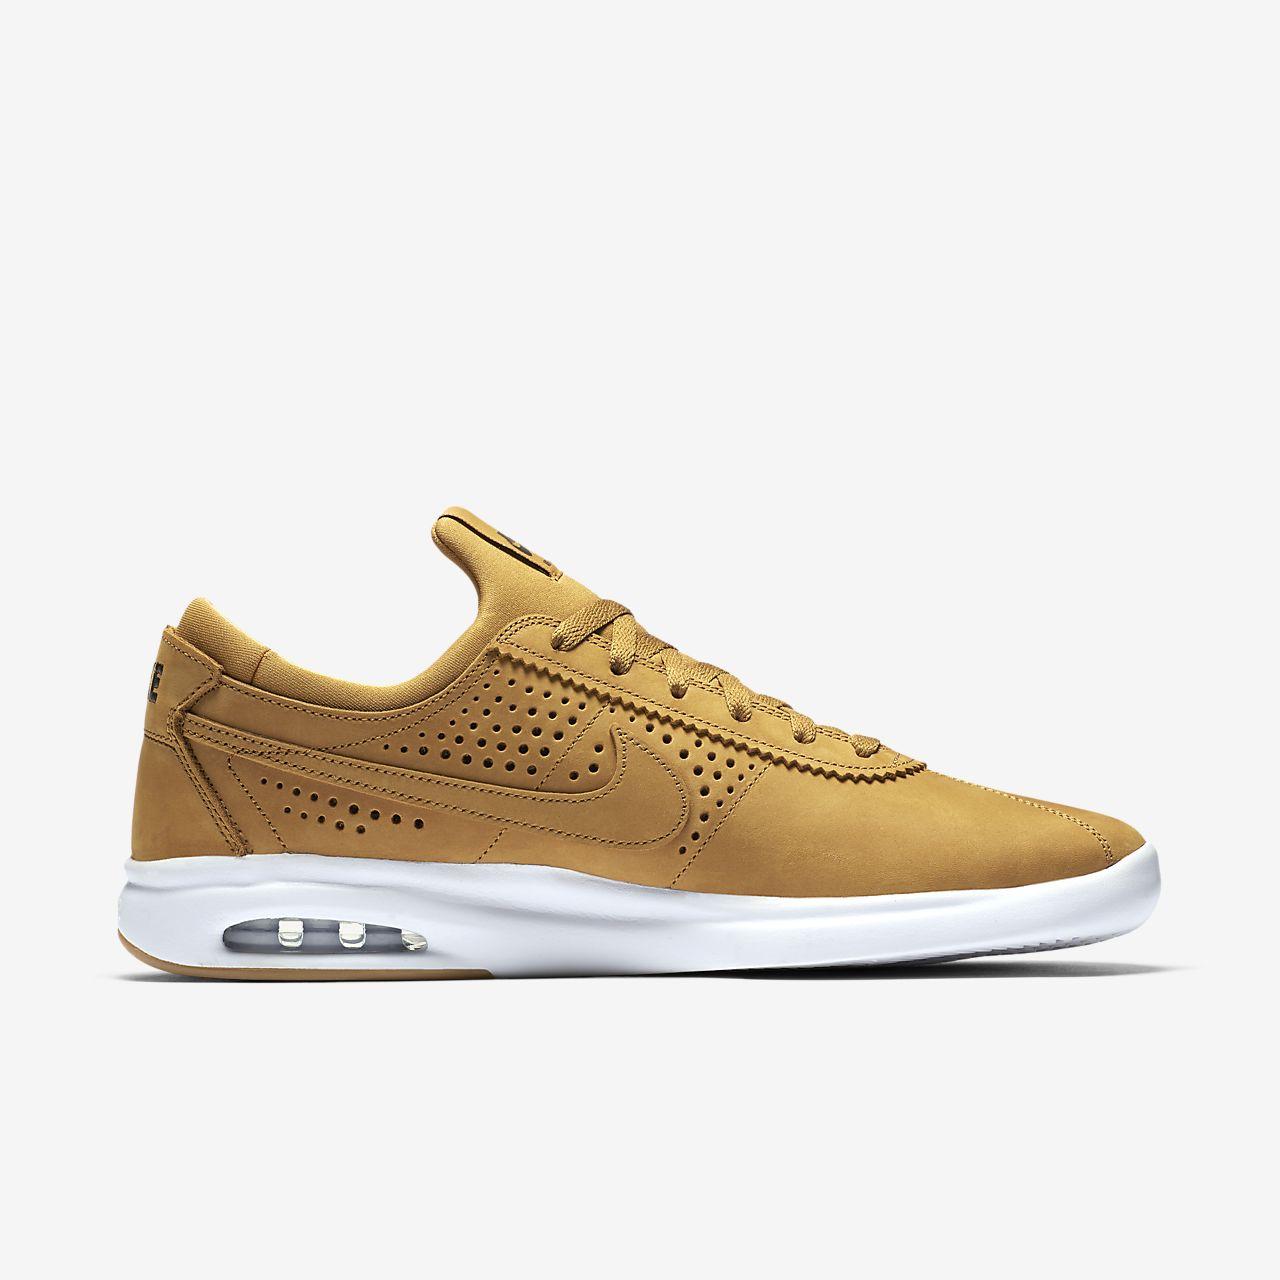 Nike Sb Air Max Bruin Vapor Shoes